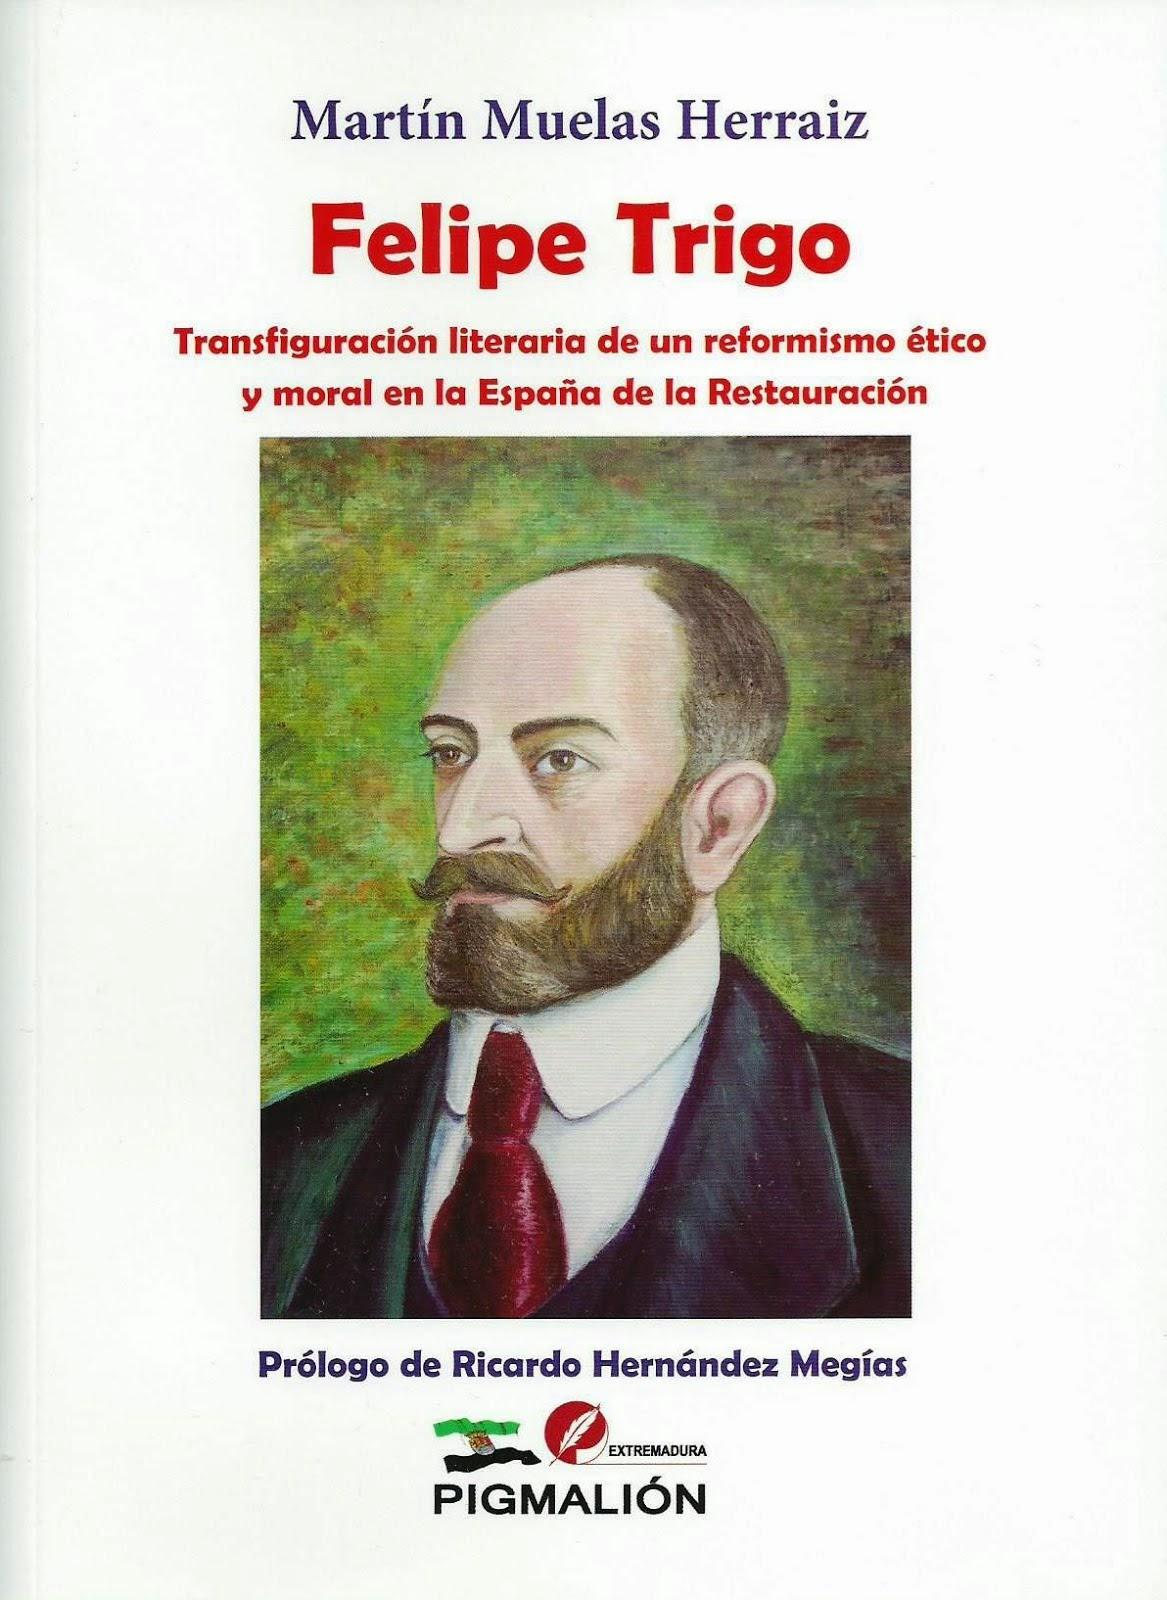 Felipe Trigo